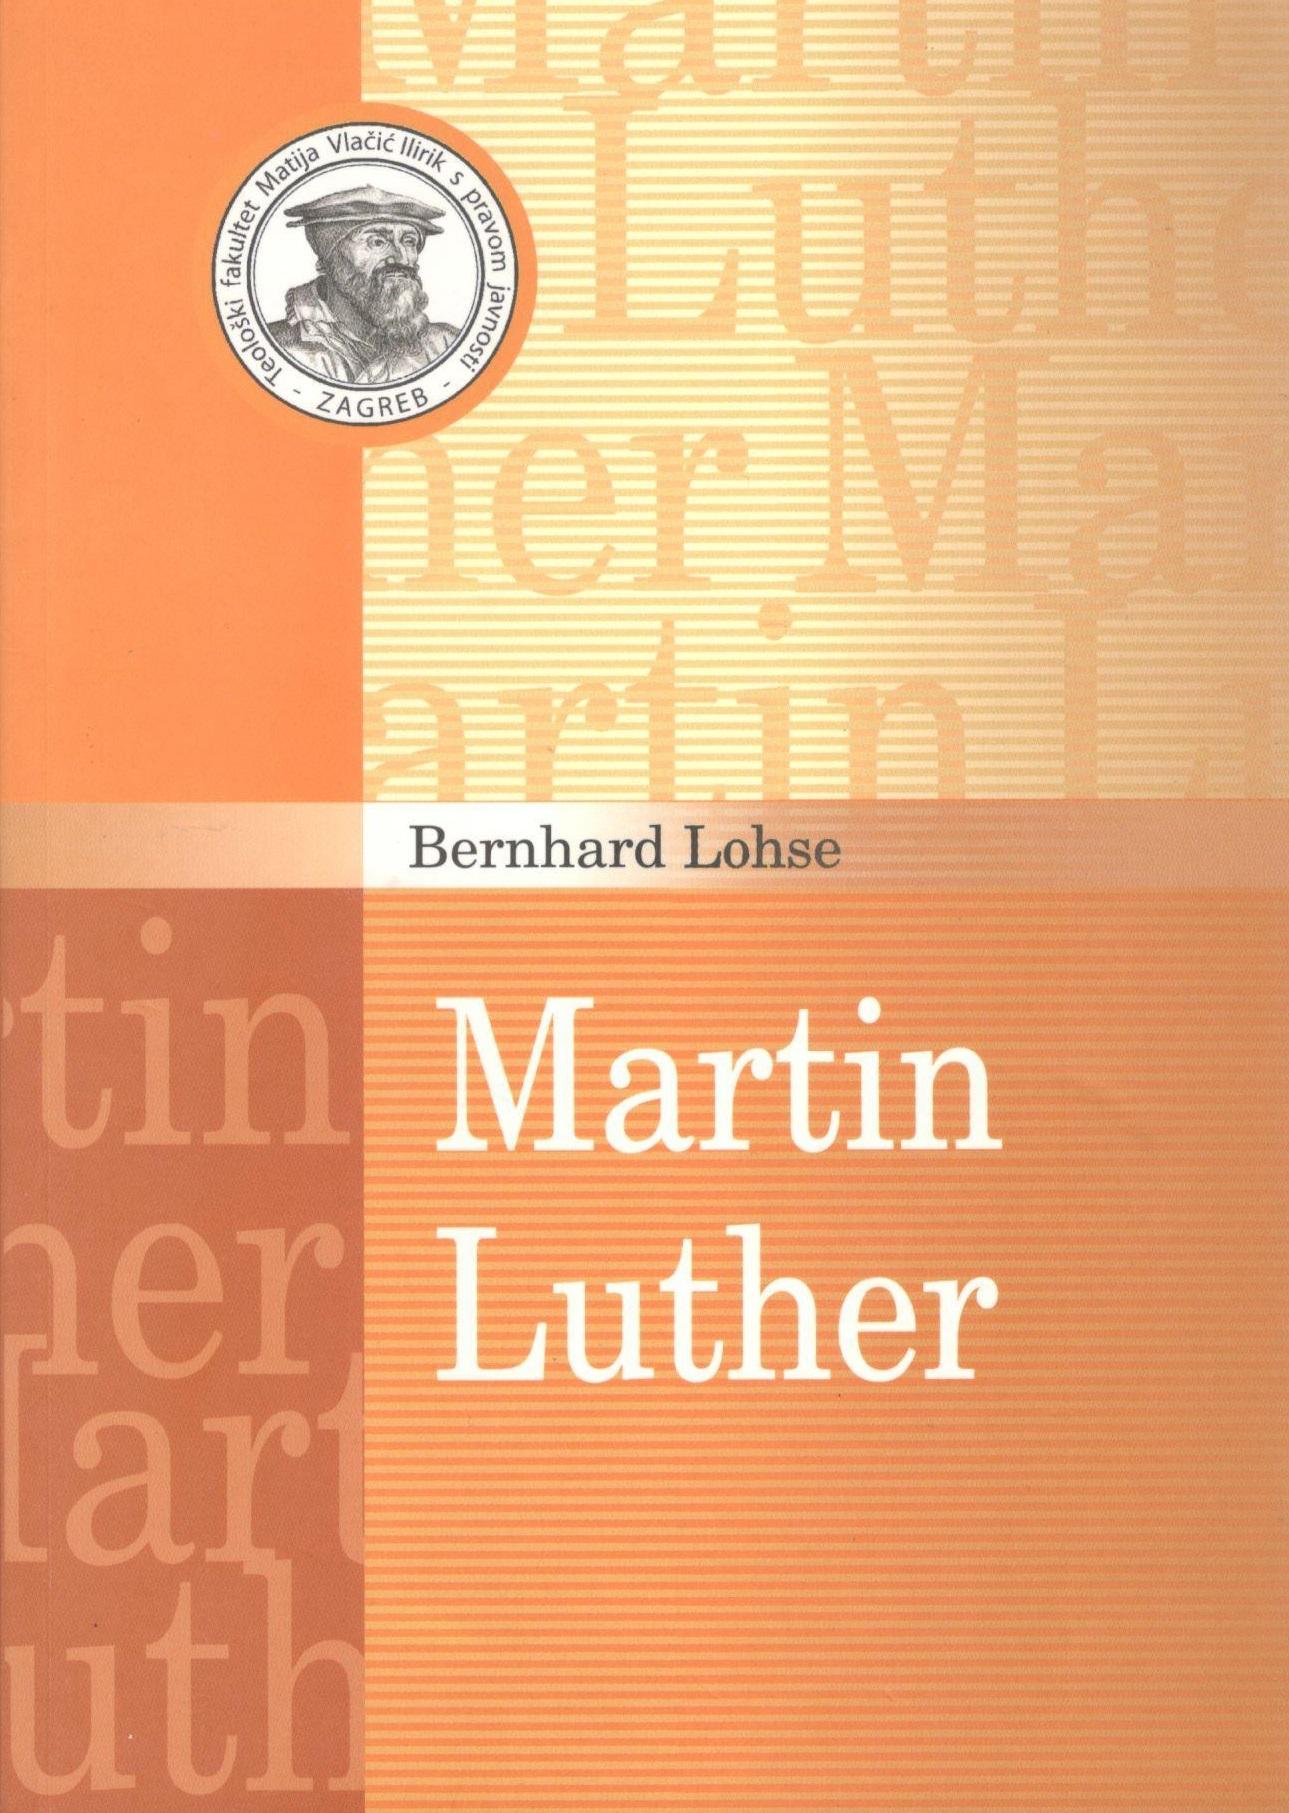 Naslovnica knjige Martin Luther